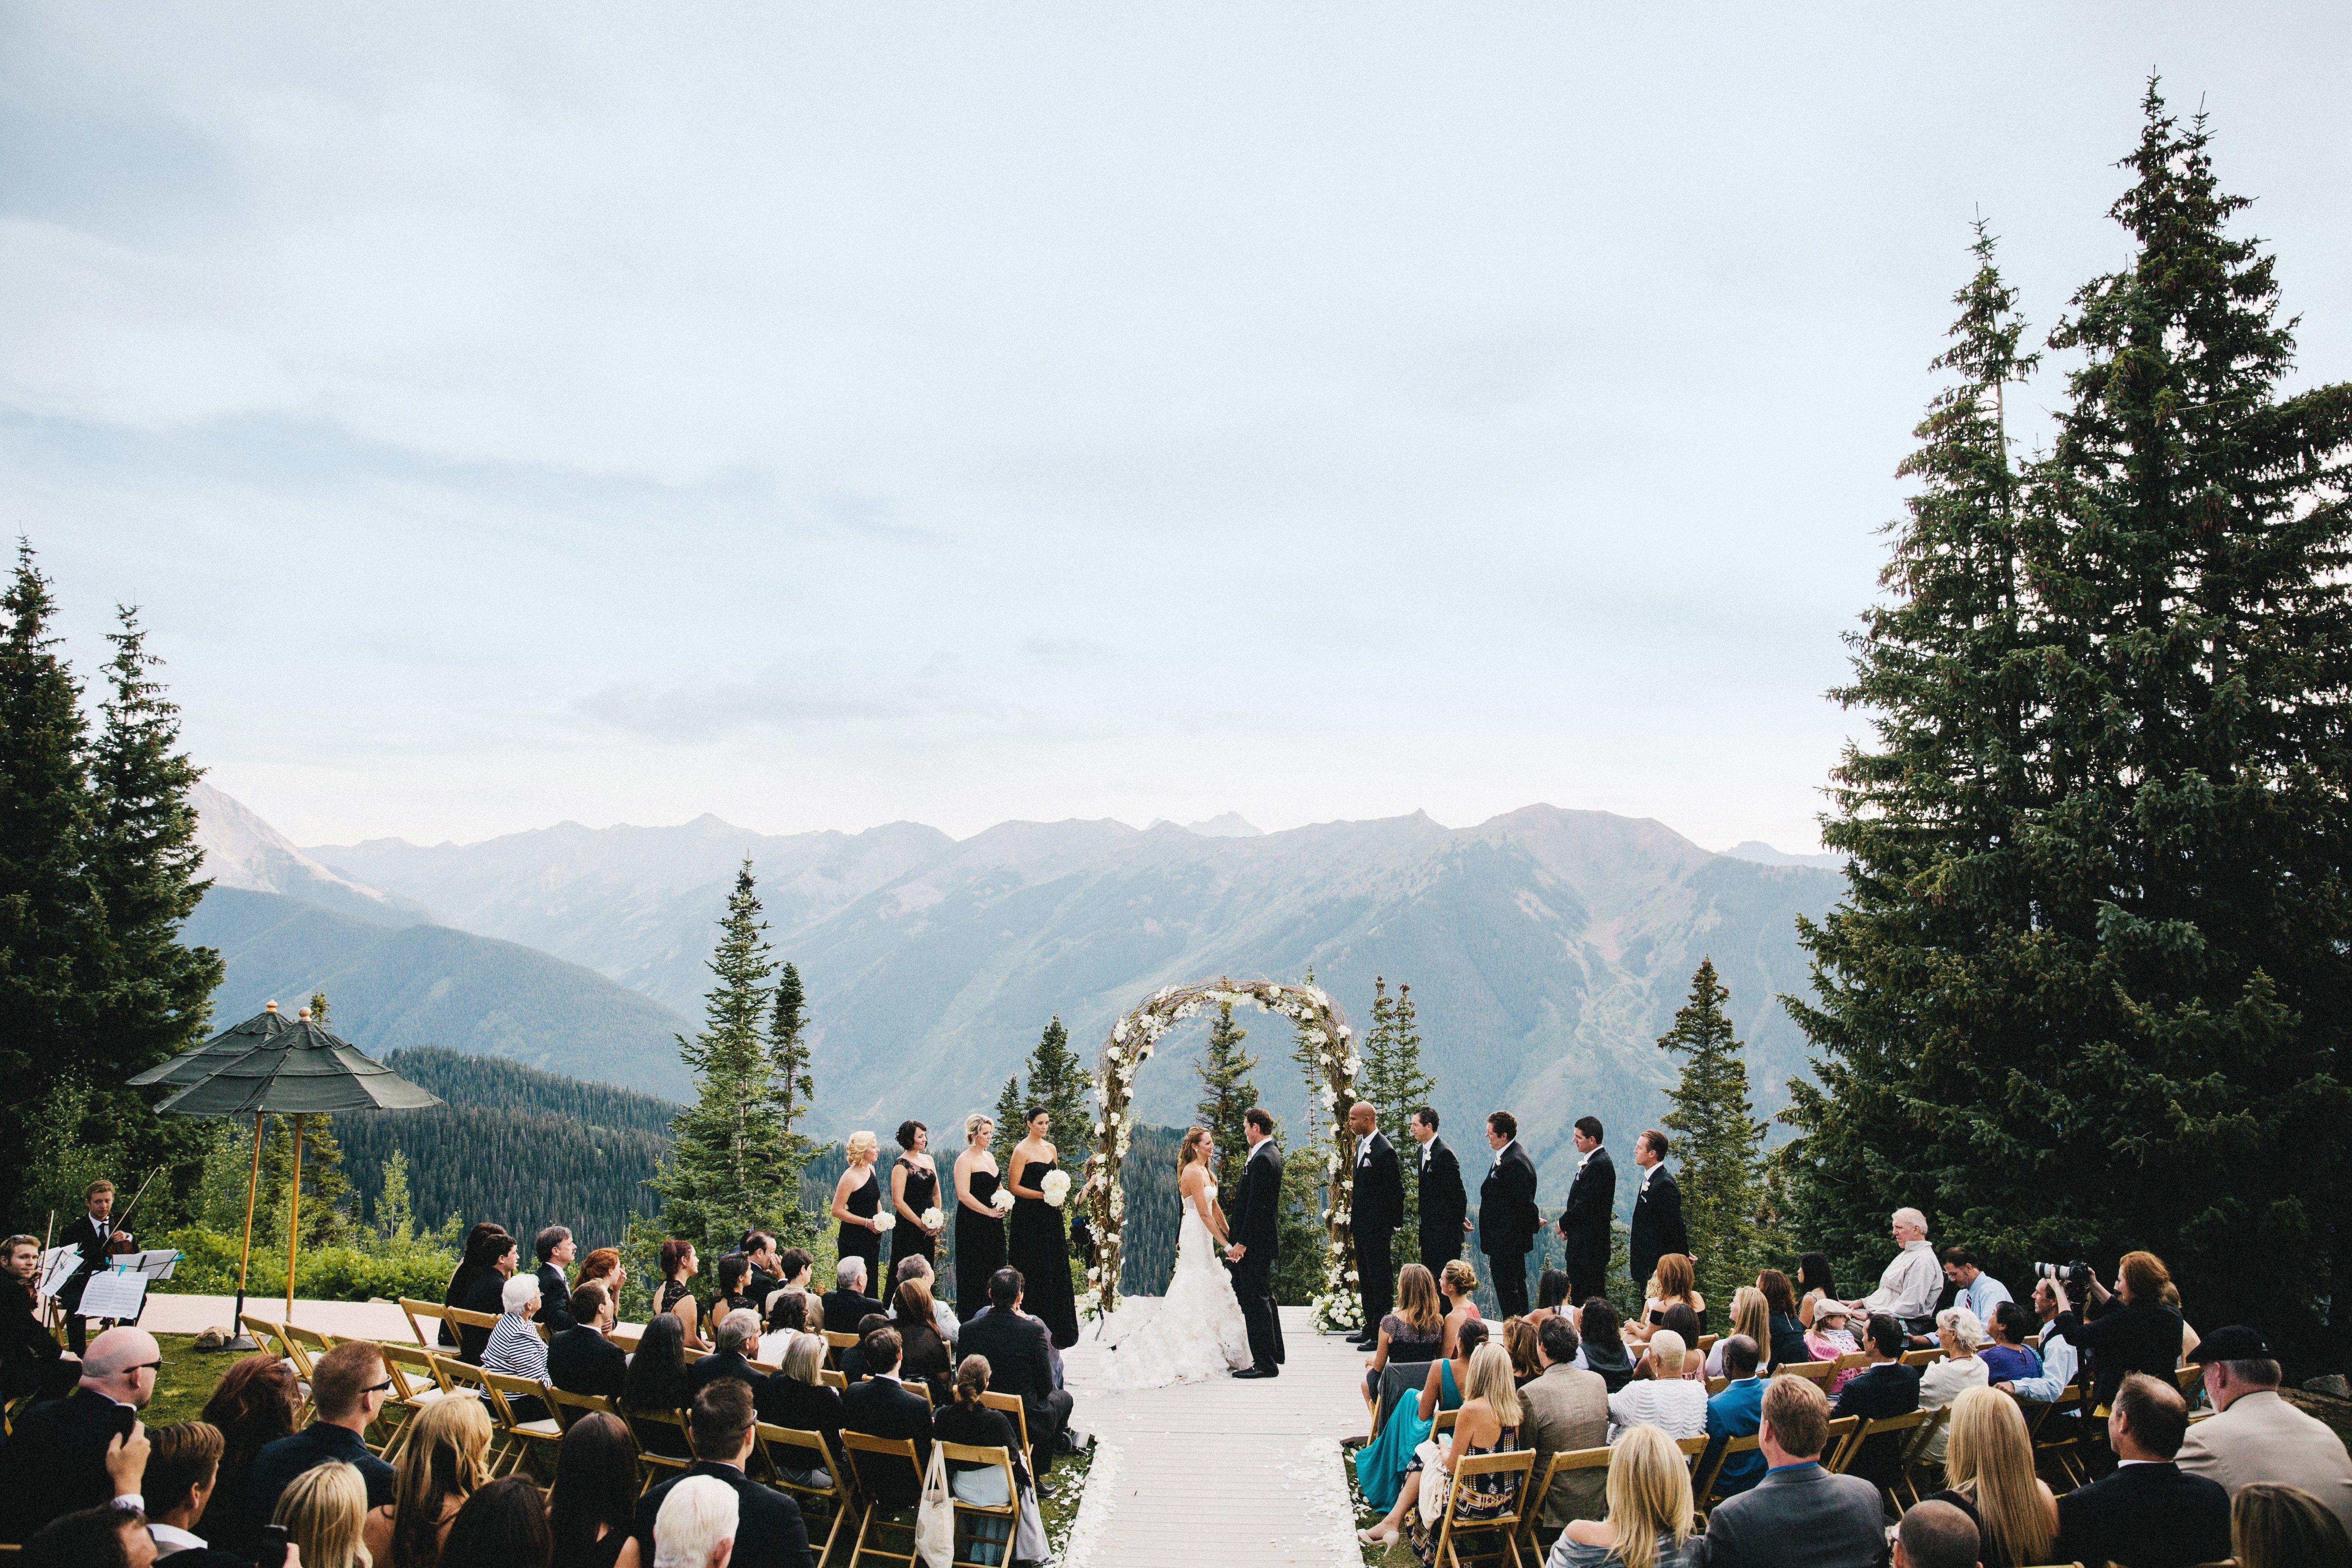 How To Choose Wedding Venue